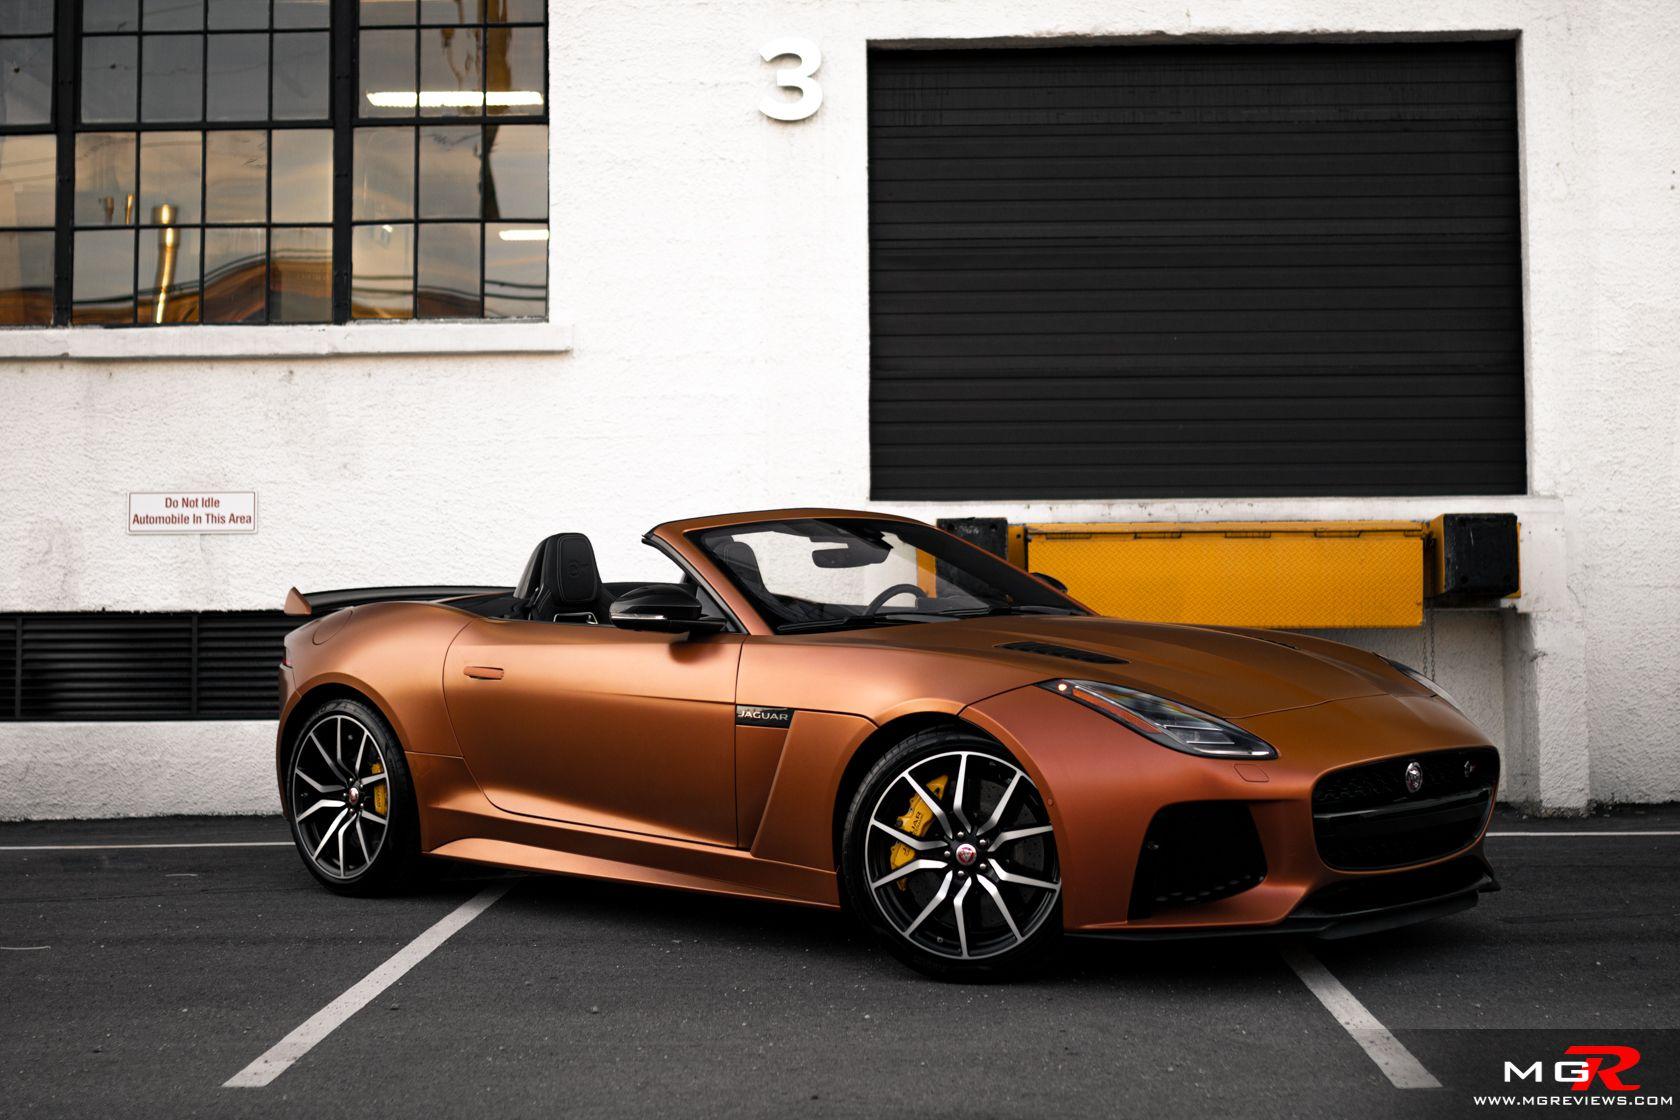 Photos 2019 Jaguar F Type Svr Convertible Jaguar F Type Jaguar Automotive Photography